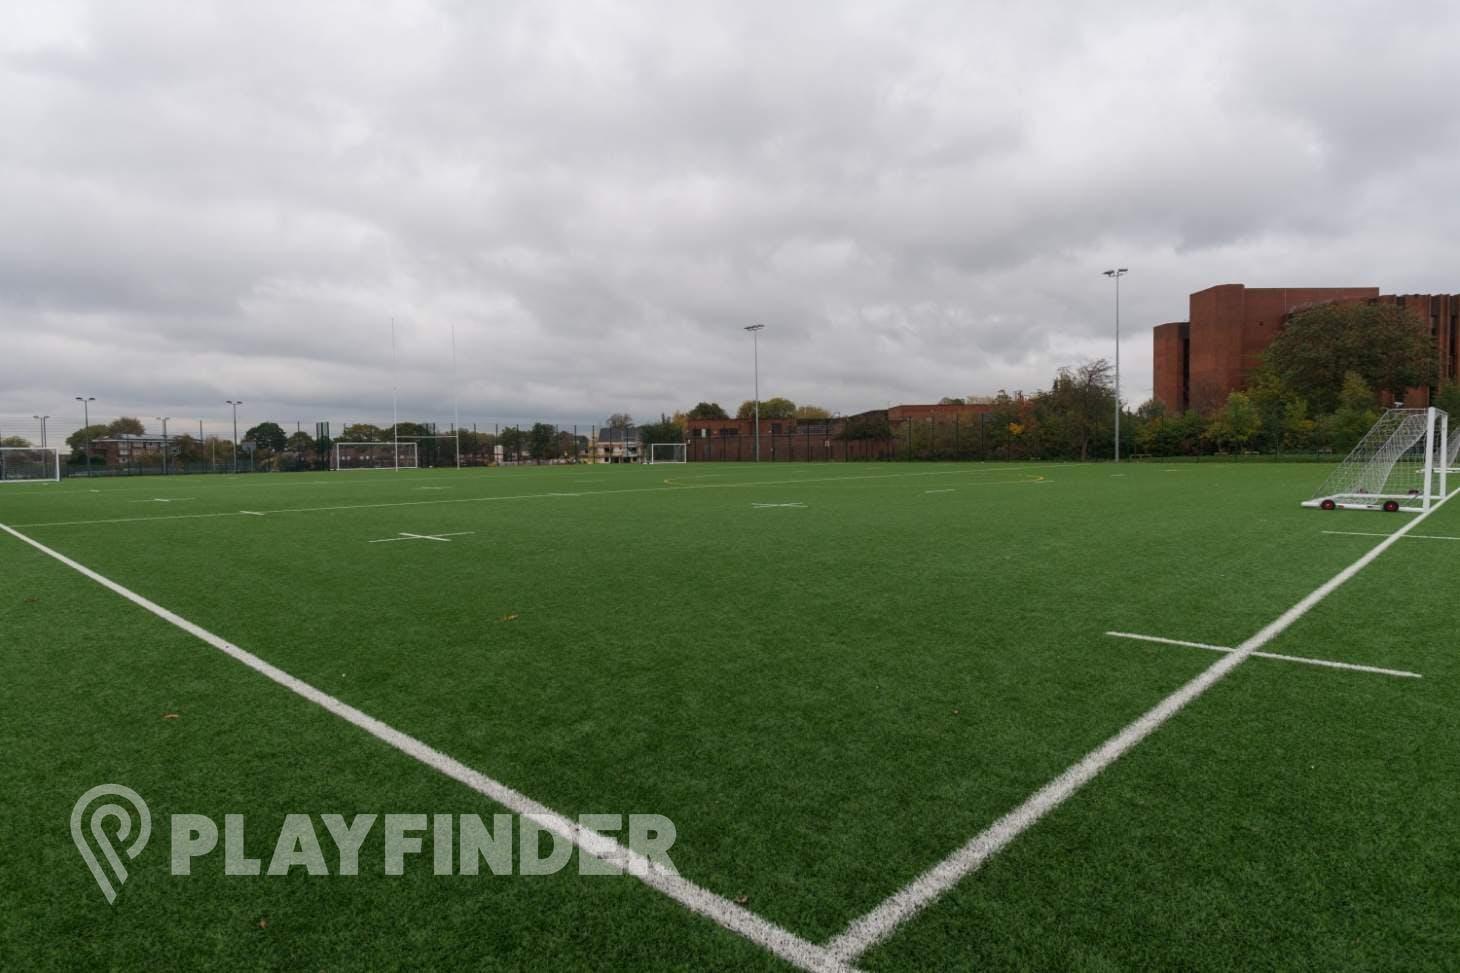 Manchester Enterprise Academy Wythenshawe Training pitch   3G Astroturf rugby pitch